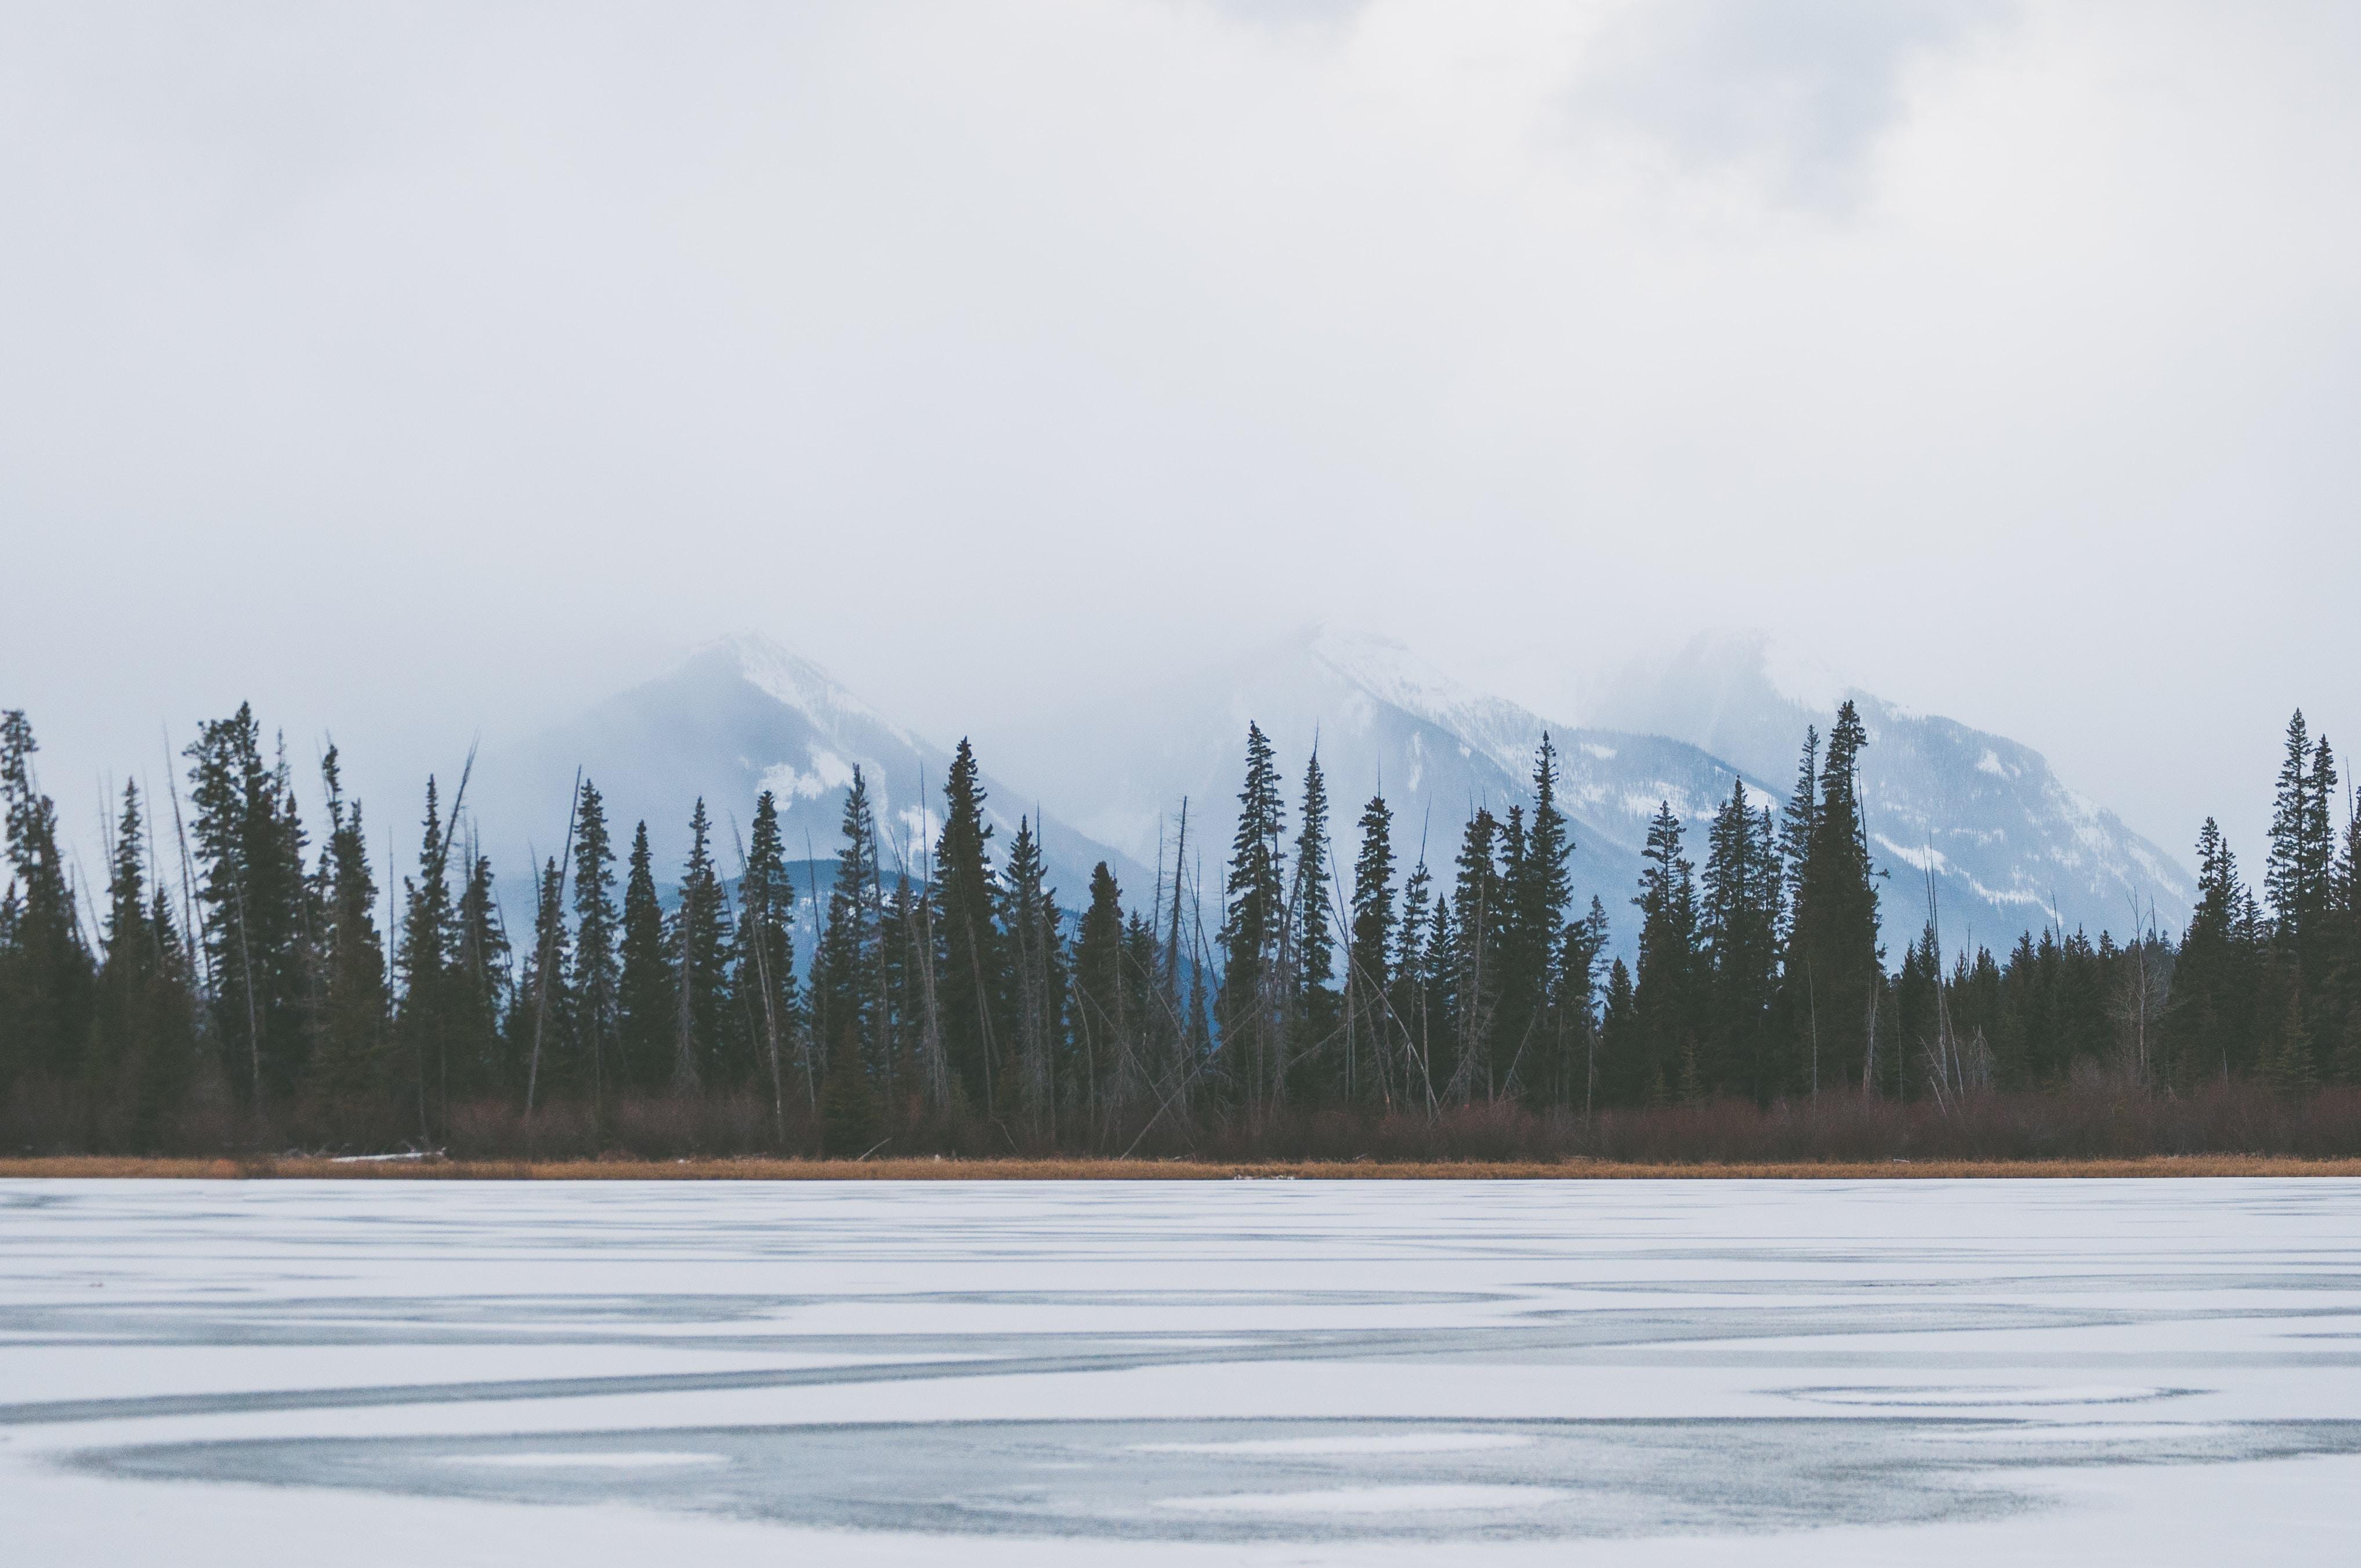 frozen lake near tall green trees